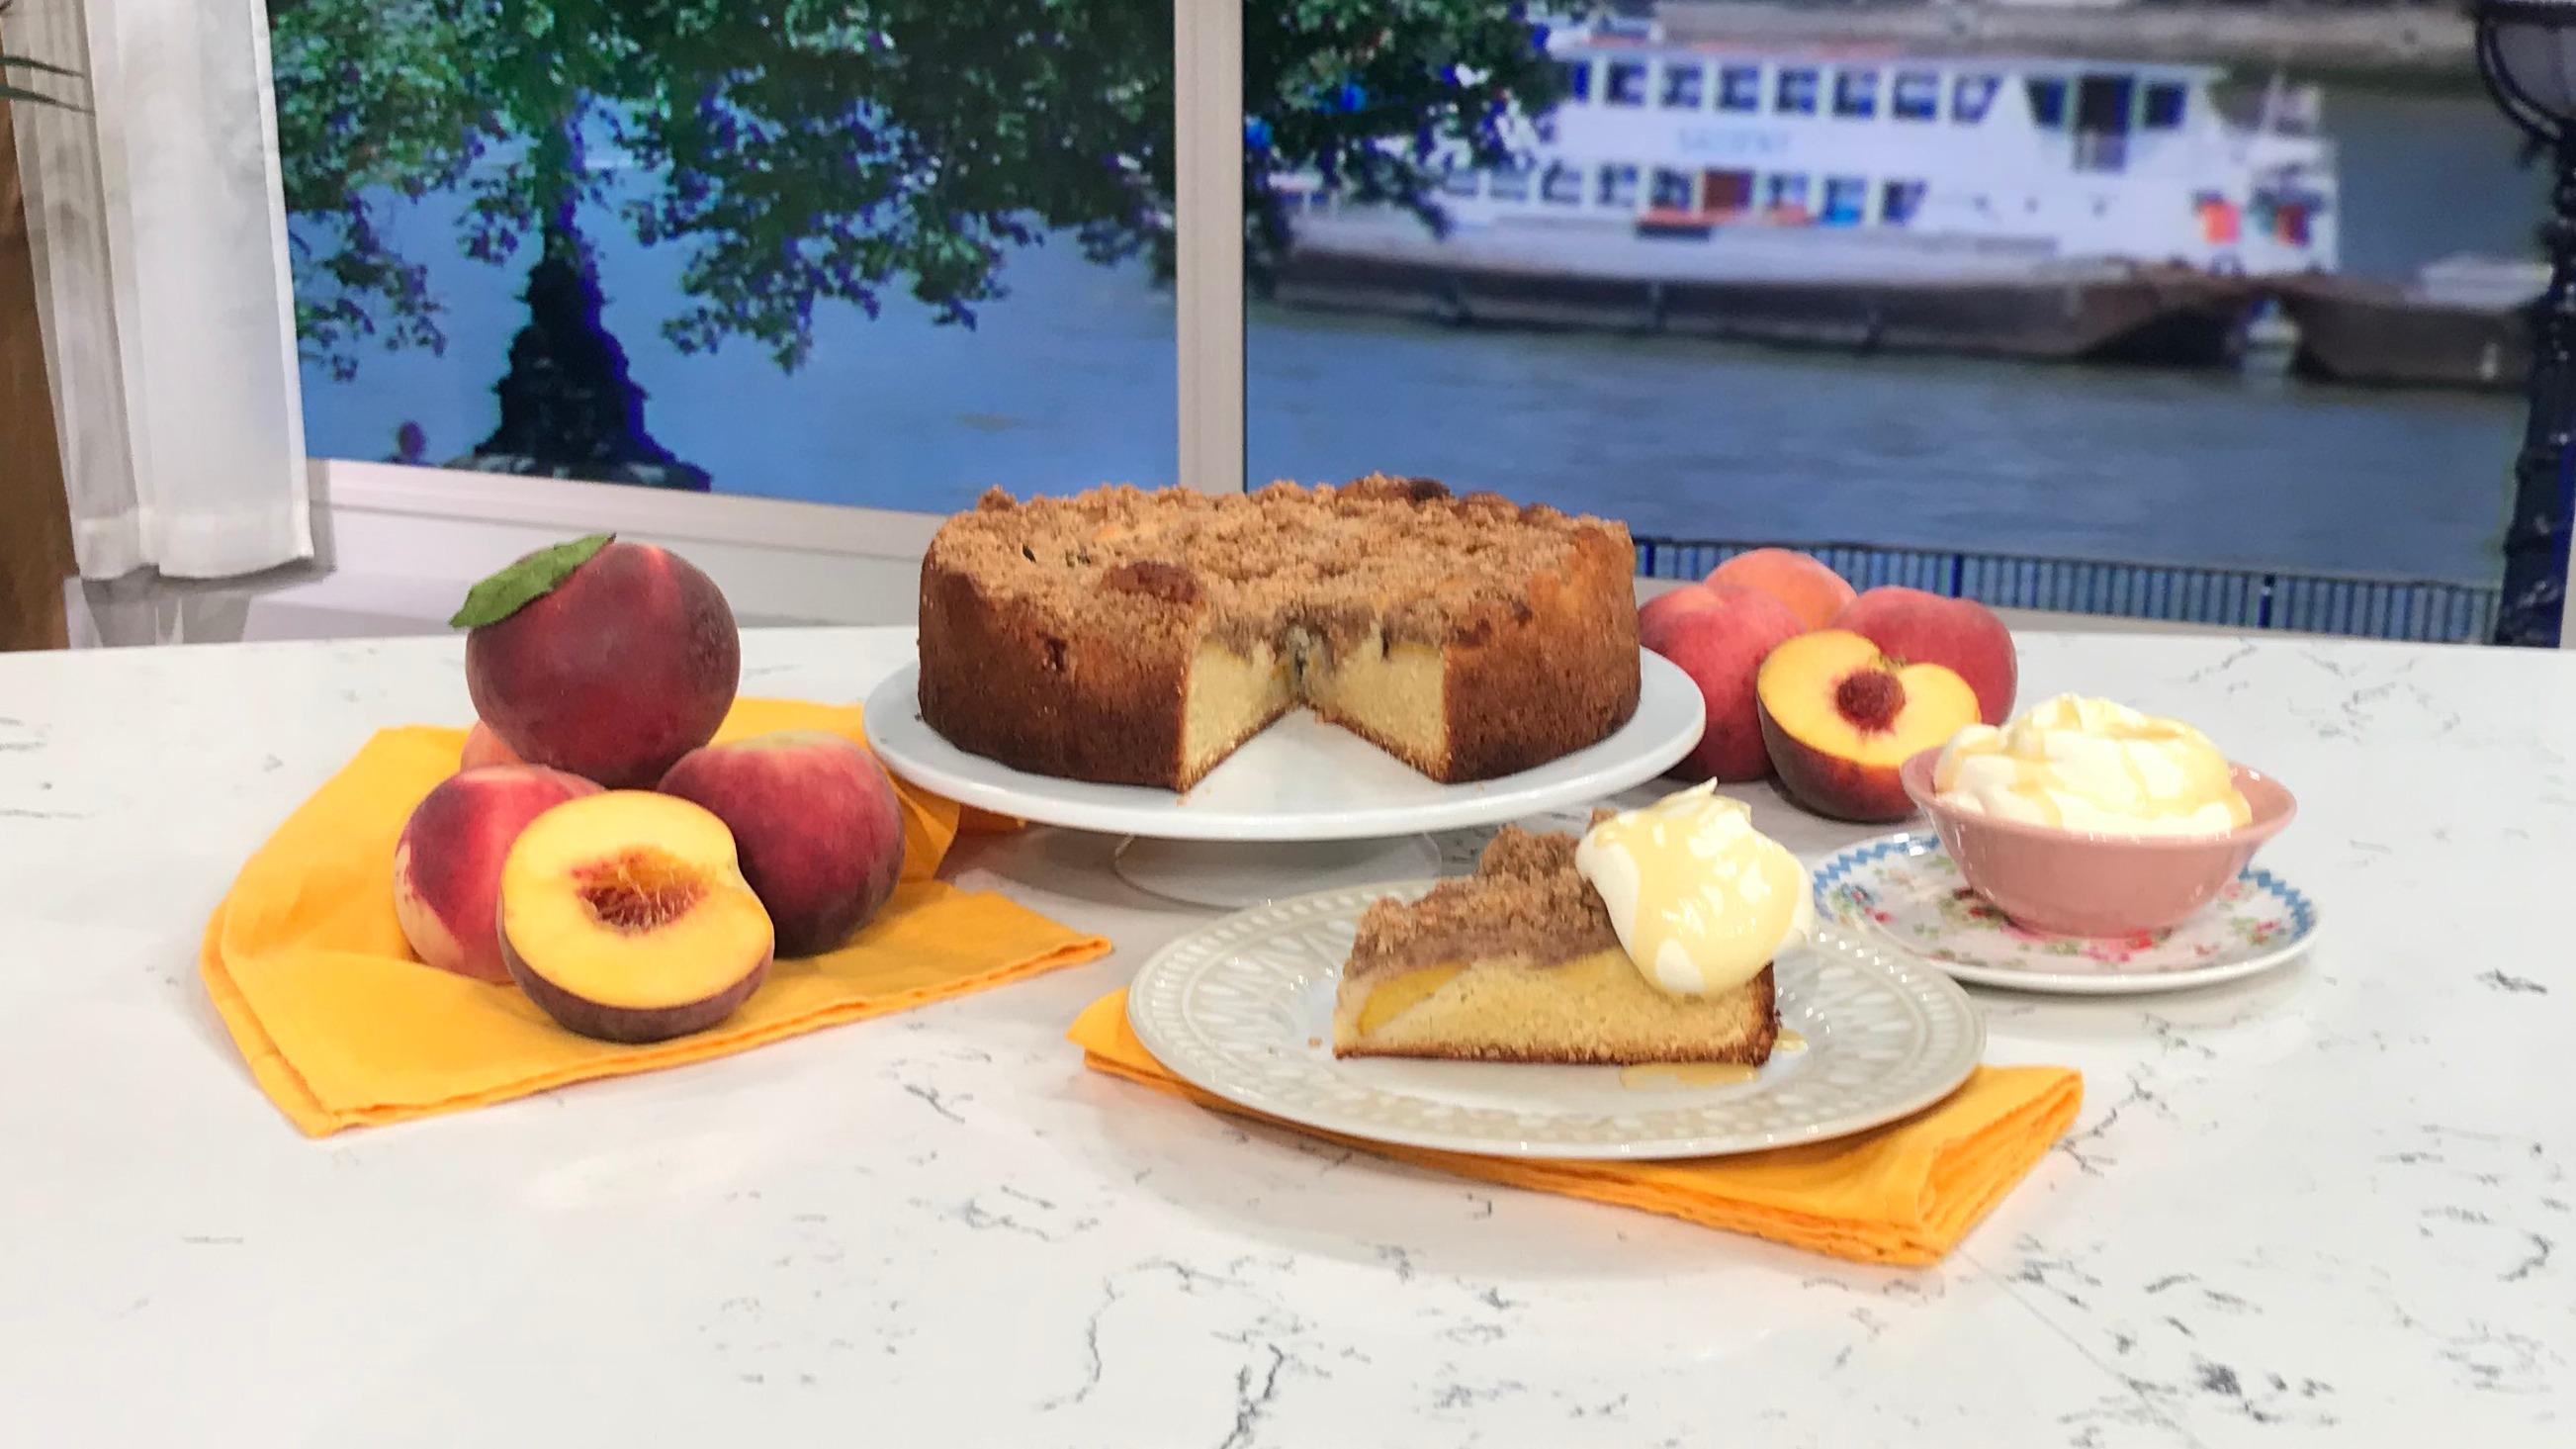 James Martin's peach crumble cake with honey cream